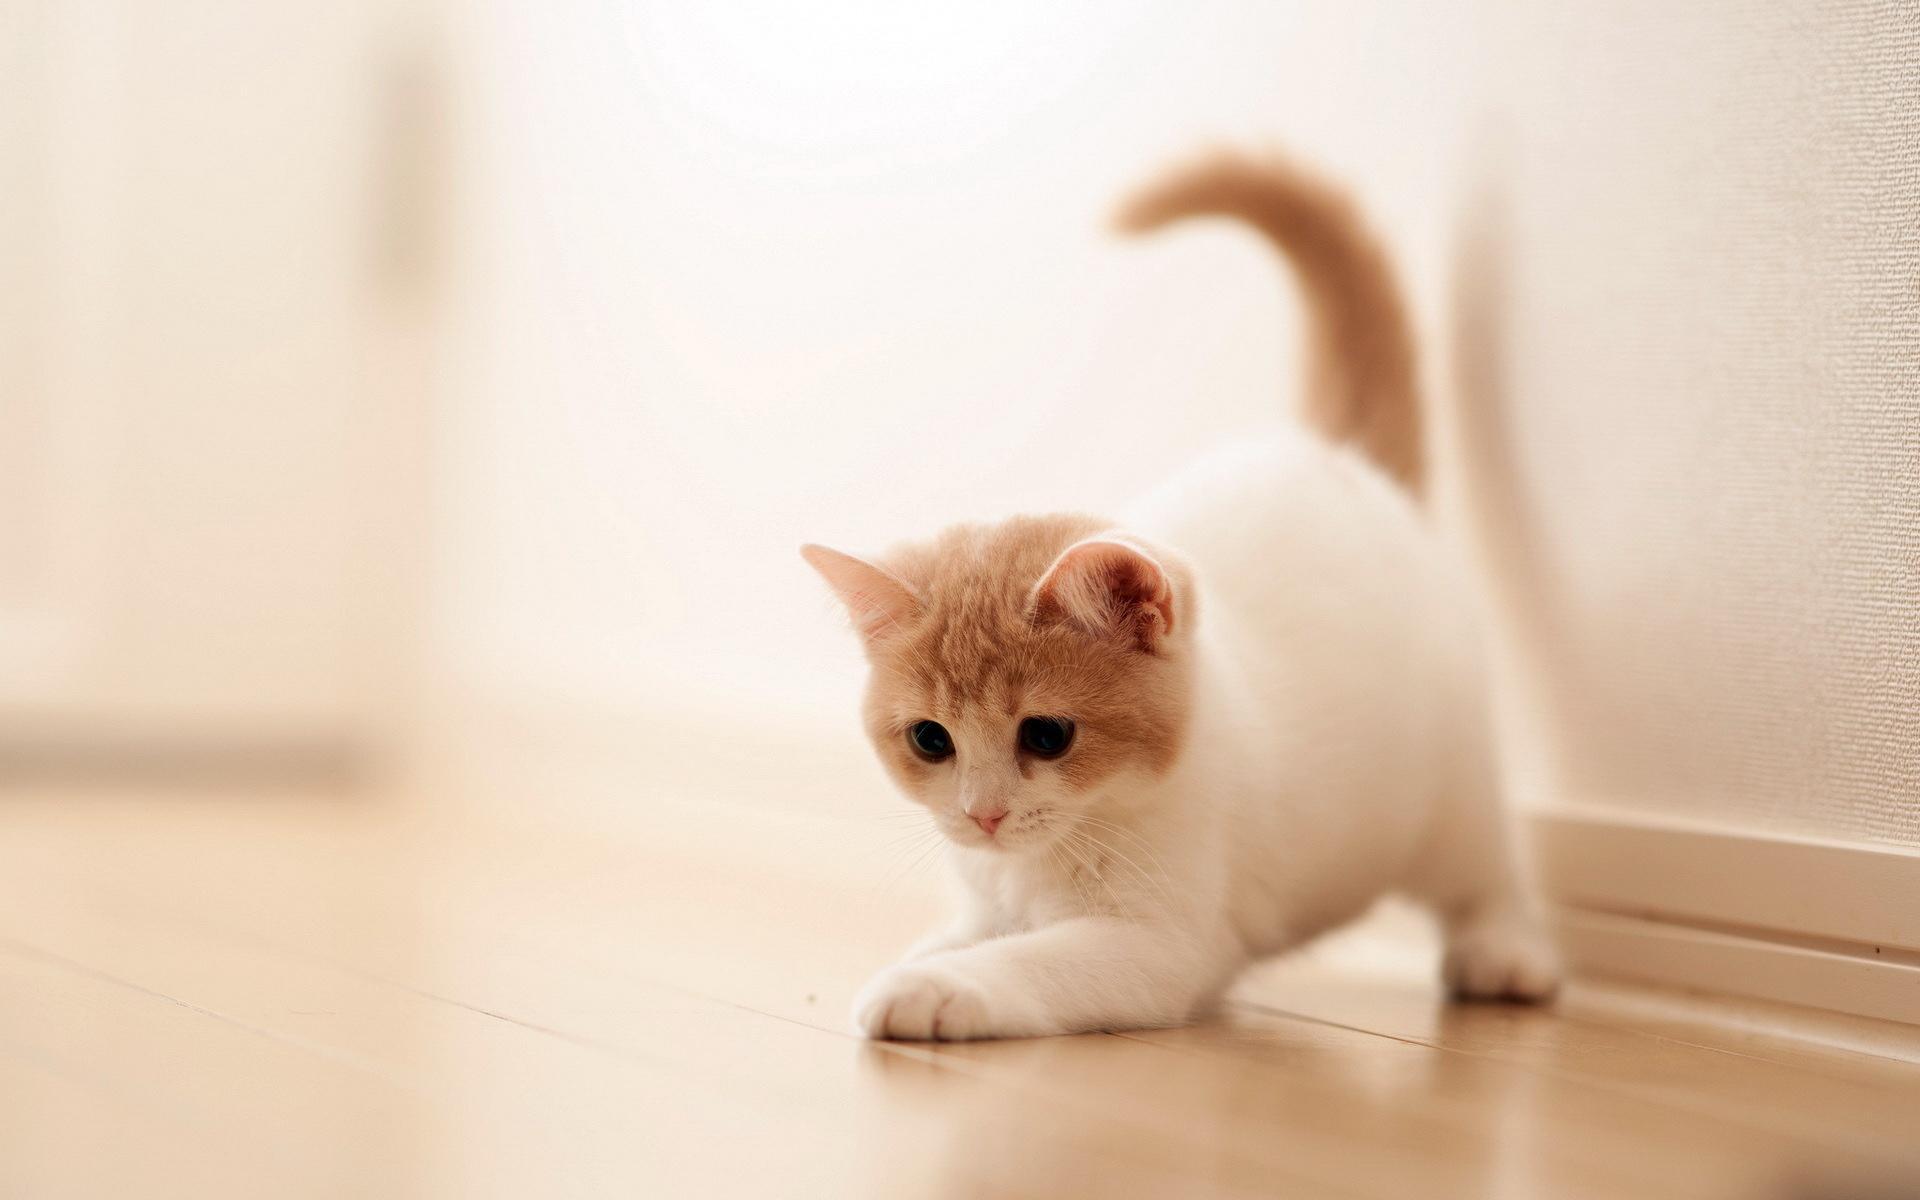 Cute Cat Backgrounds - WallpaperSafari